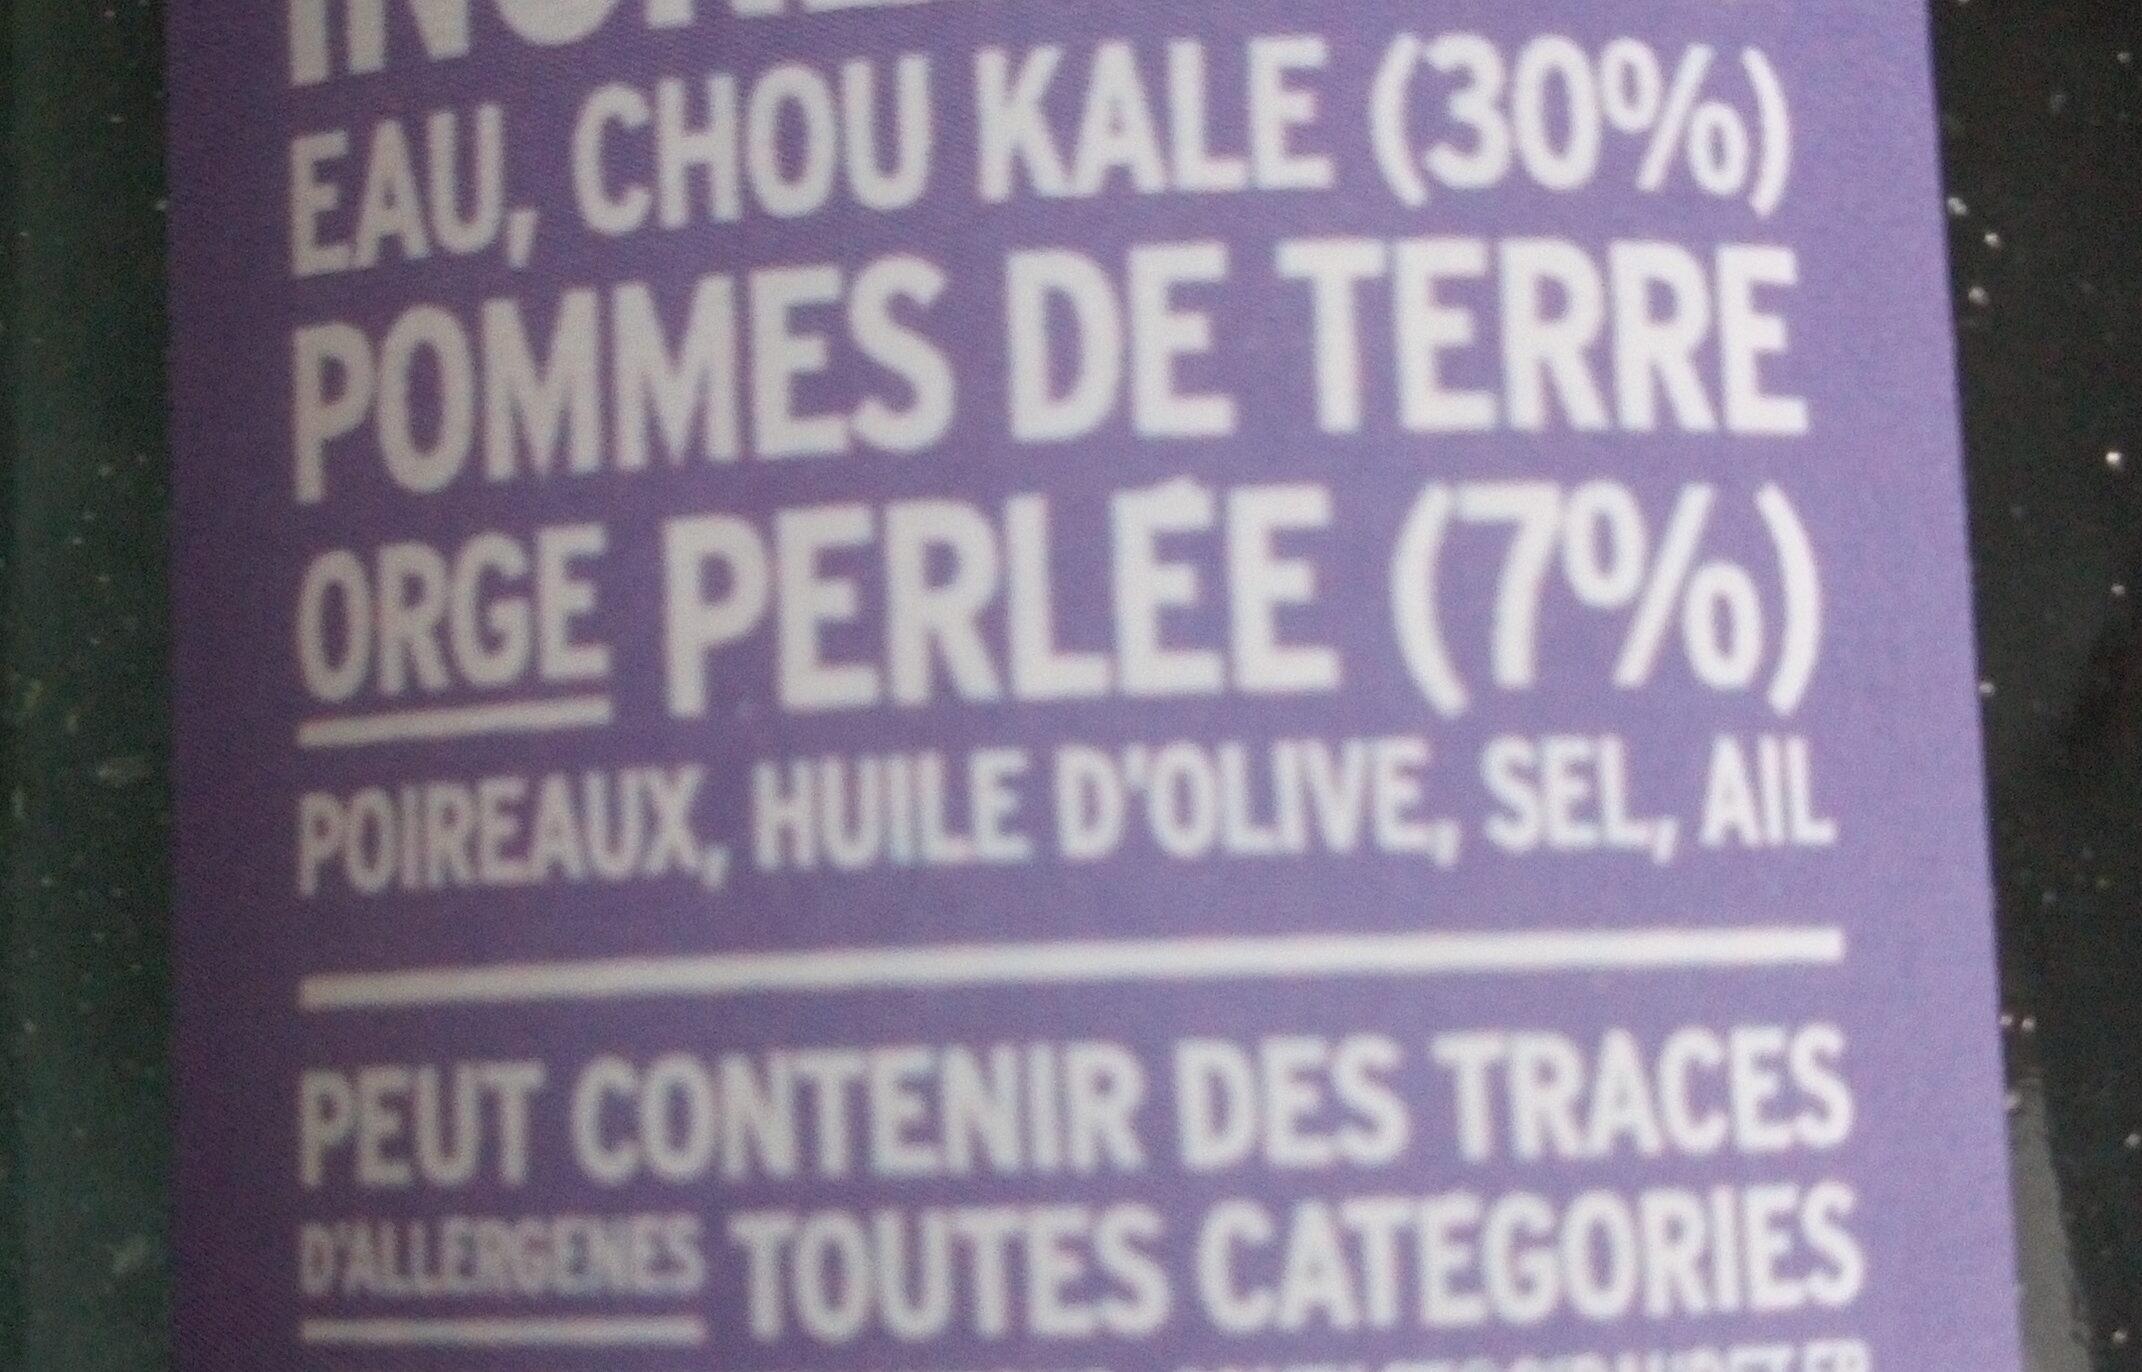 Soupe chou kale orge perlée - Ingredients - fr